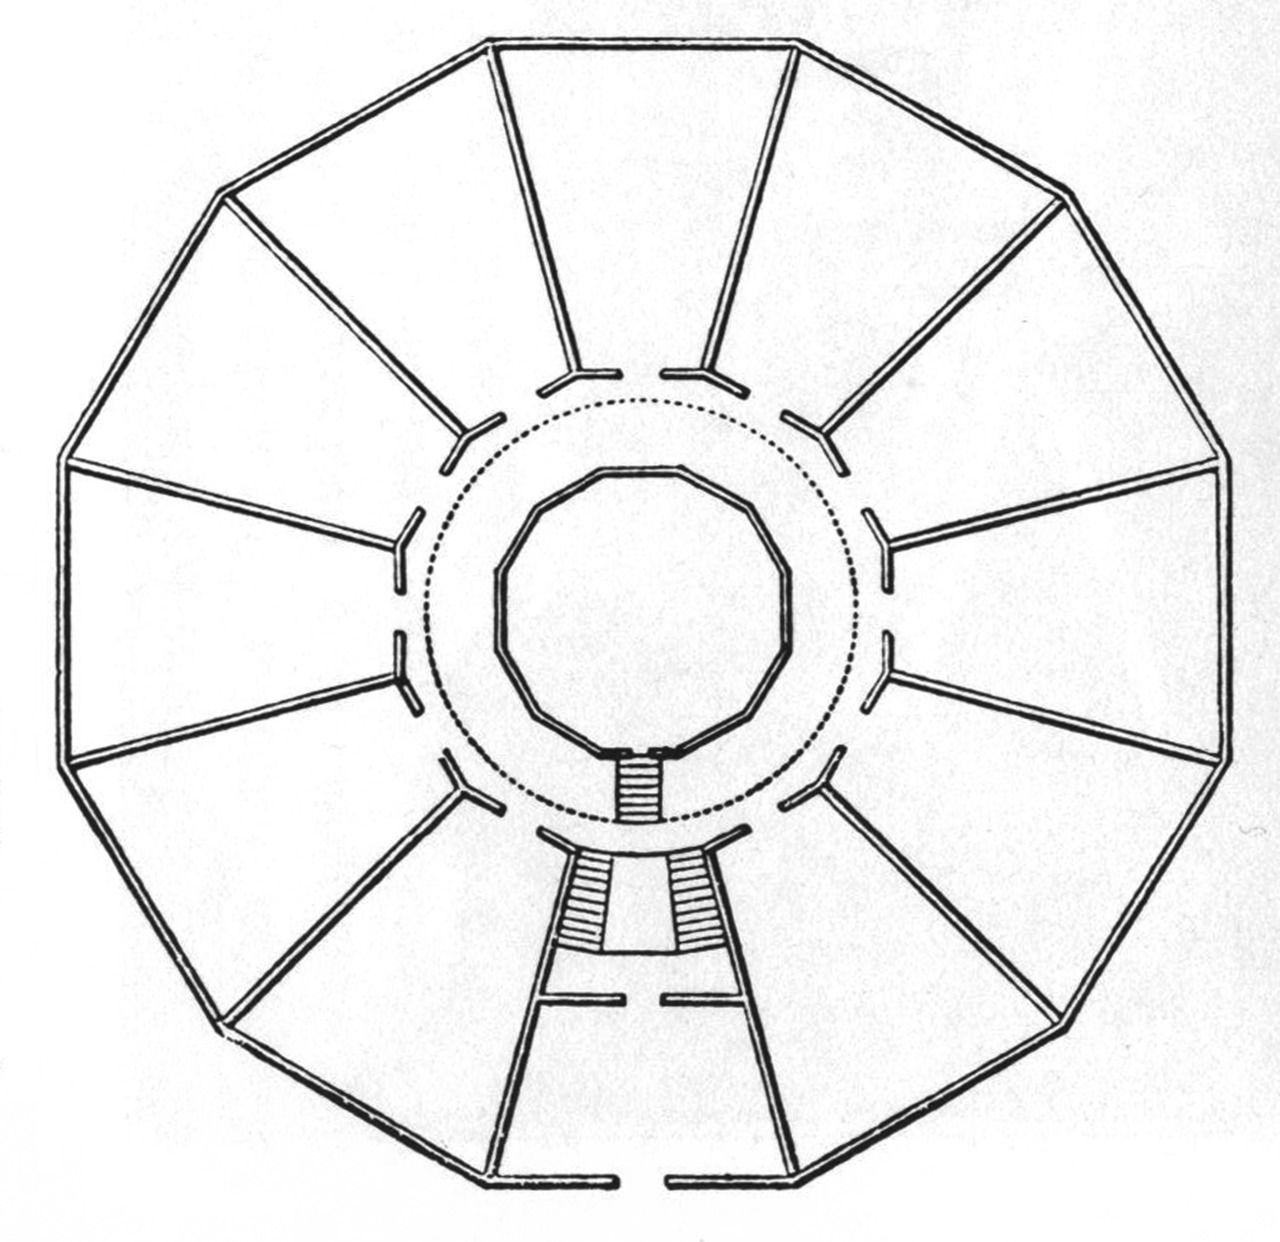 panopticon  jeremy bentham  1791